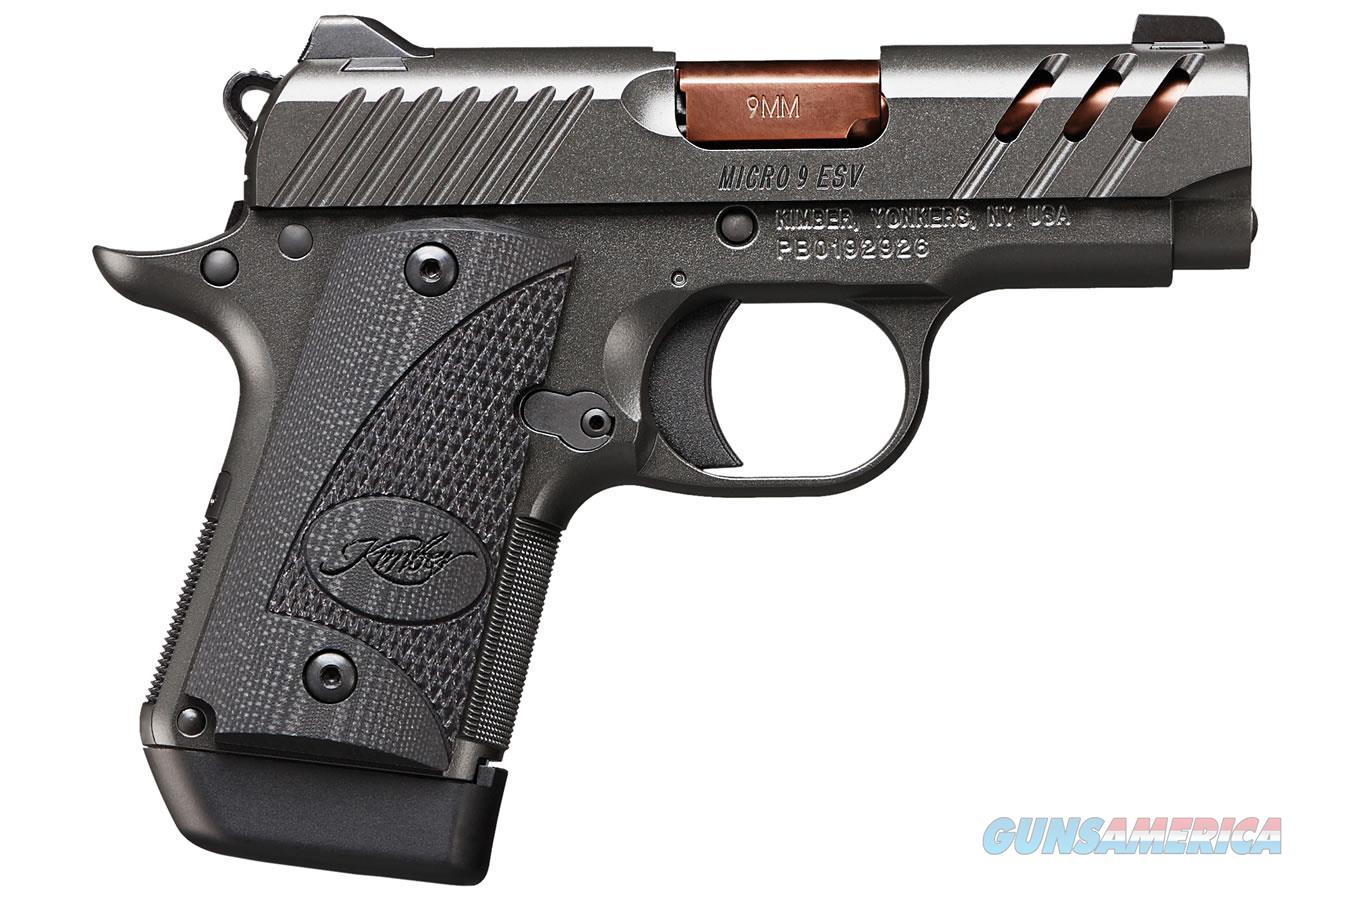 Kimber Micro ESV 9mm TiCN Rose Copper 3.15in Barrel  Guns > Pistols > Kimber of America Pistols > Micro